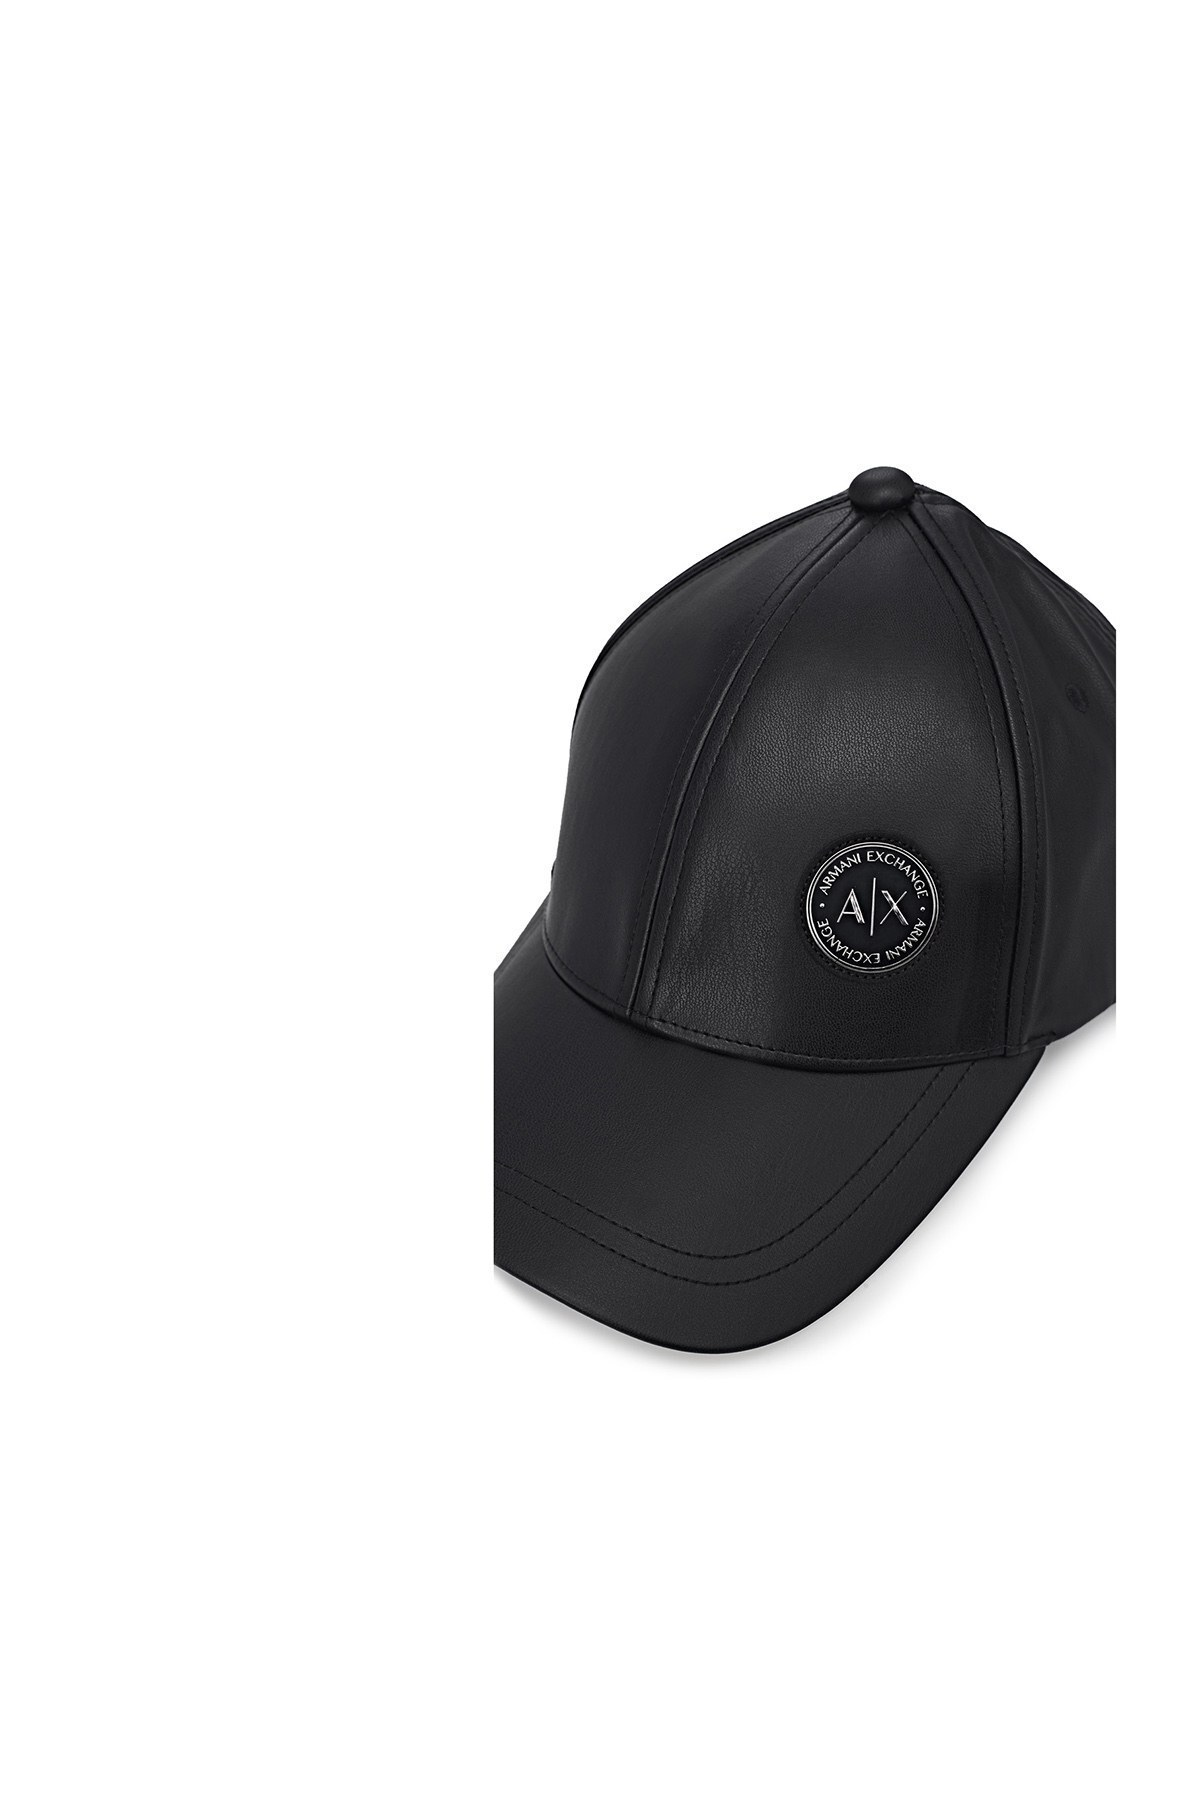 Armani Exchange Erkek Şapka 954047 0A782 00020 SİYAH